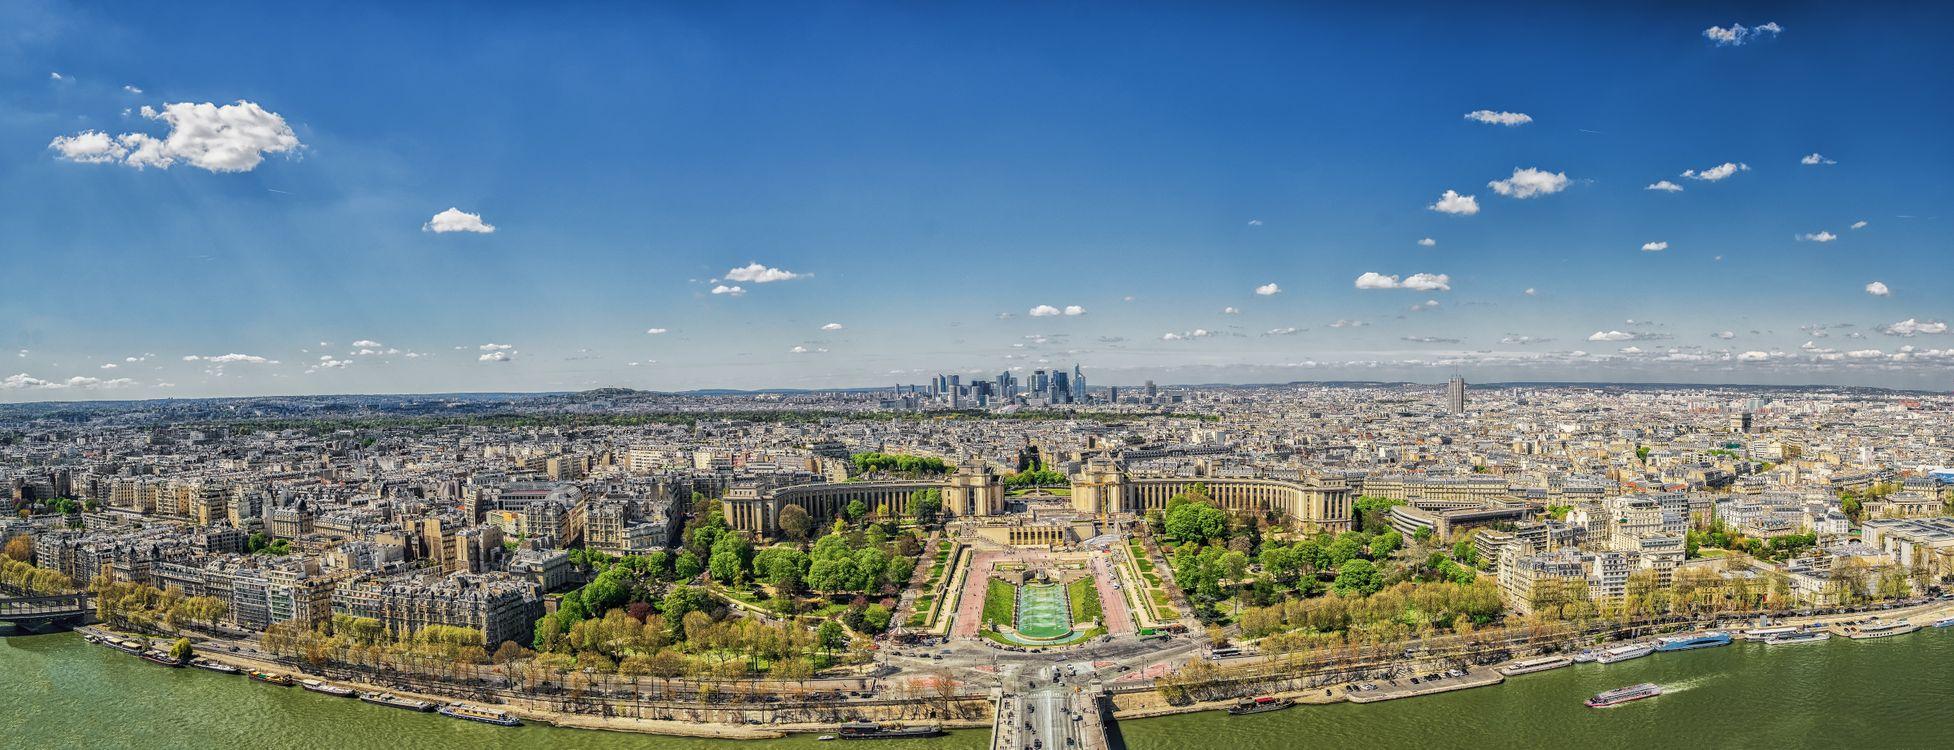 Фото галерея Париж панорама - бесплатные картинки на Fonwall